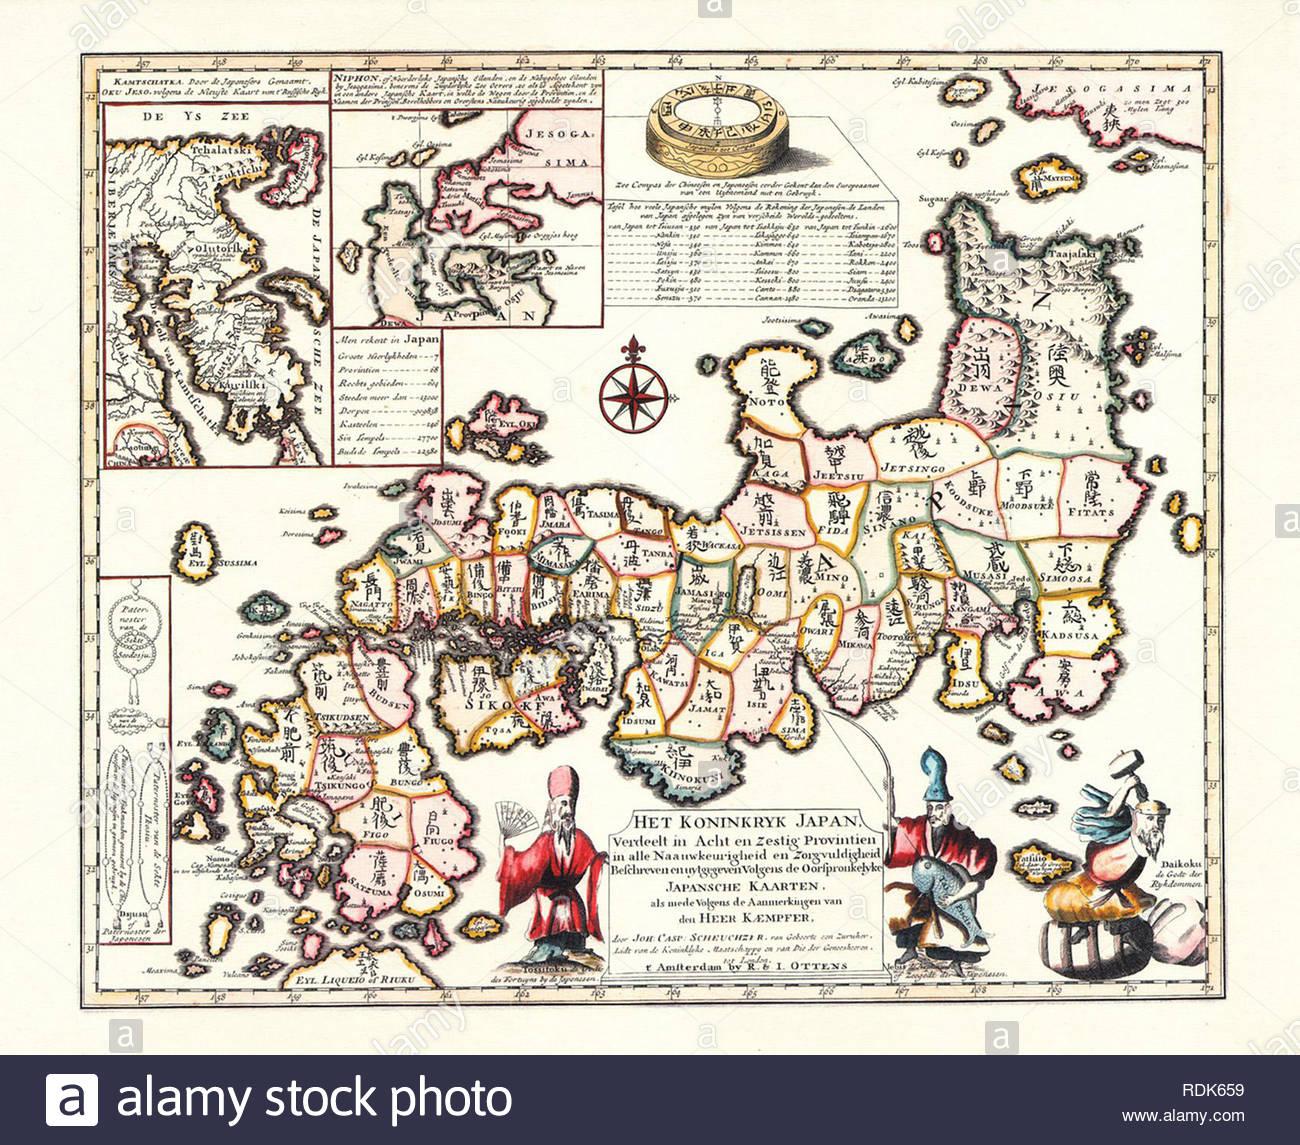 Ancient Map Of Japan.Ancient Map Japan Stock Photos Ancient Map Japan Stock Images Alamy